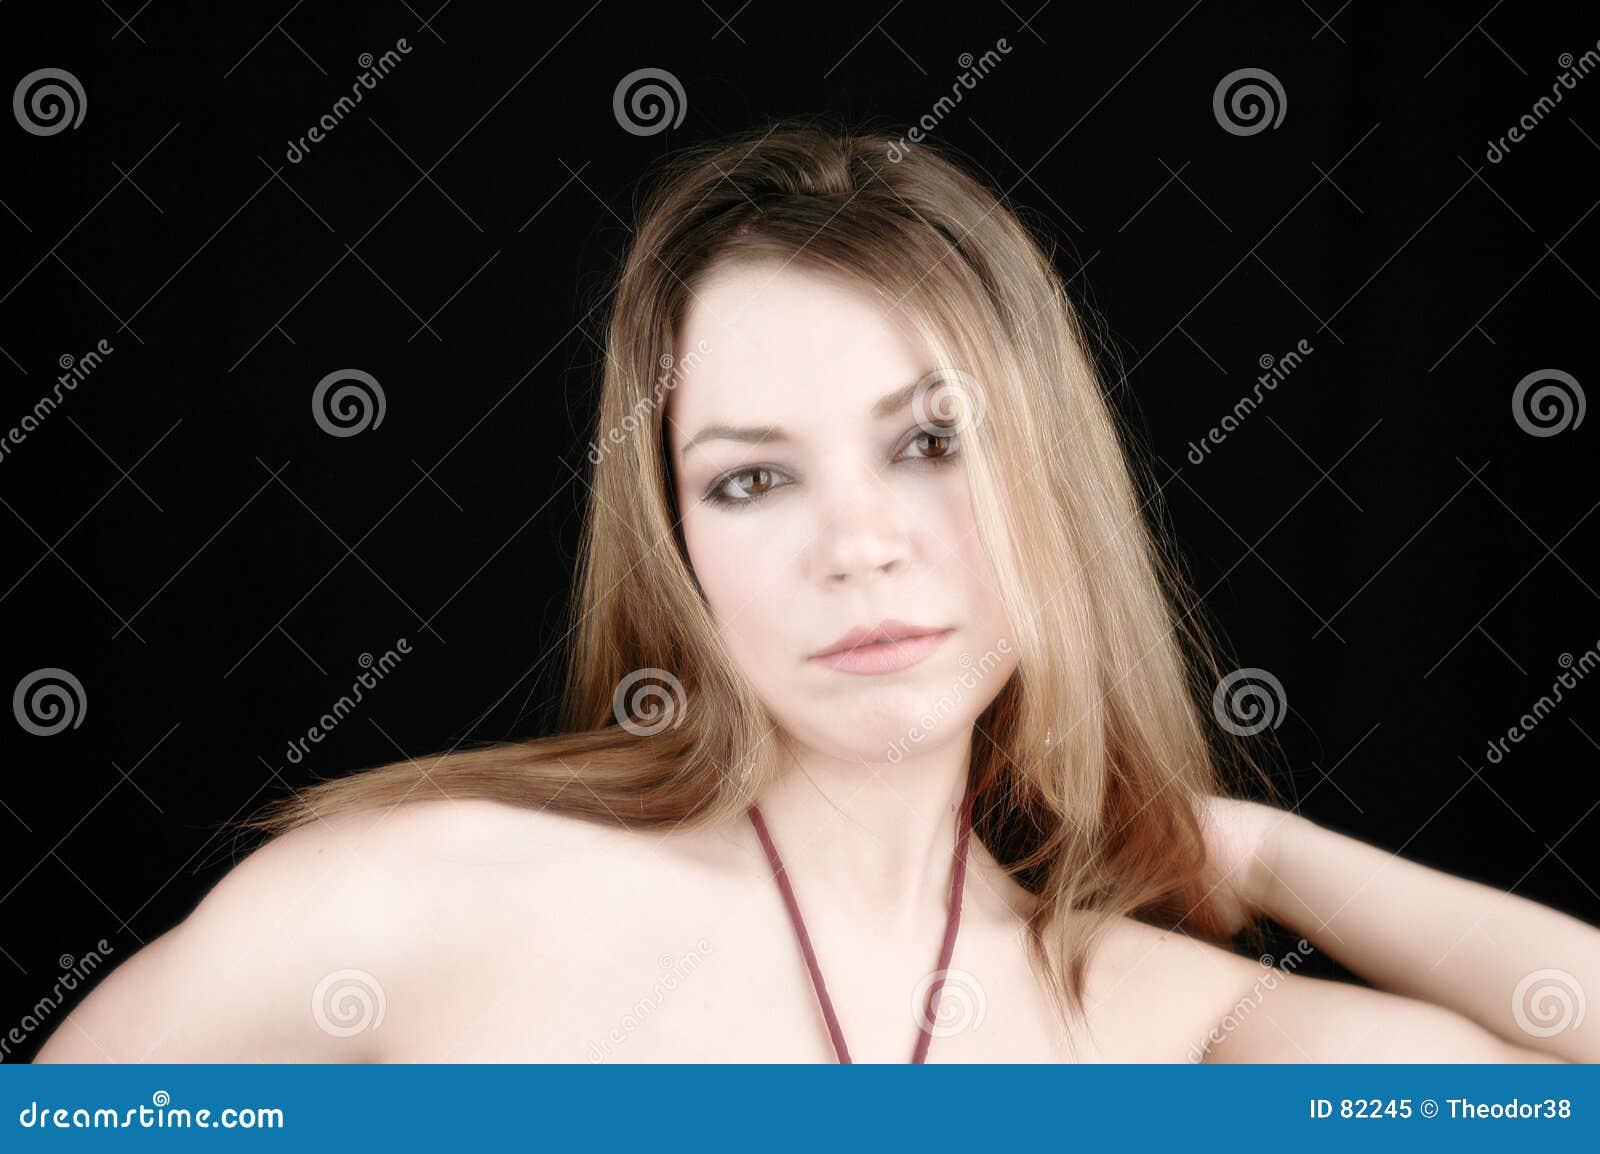 Attractive woman-15